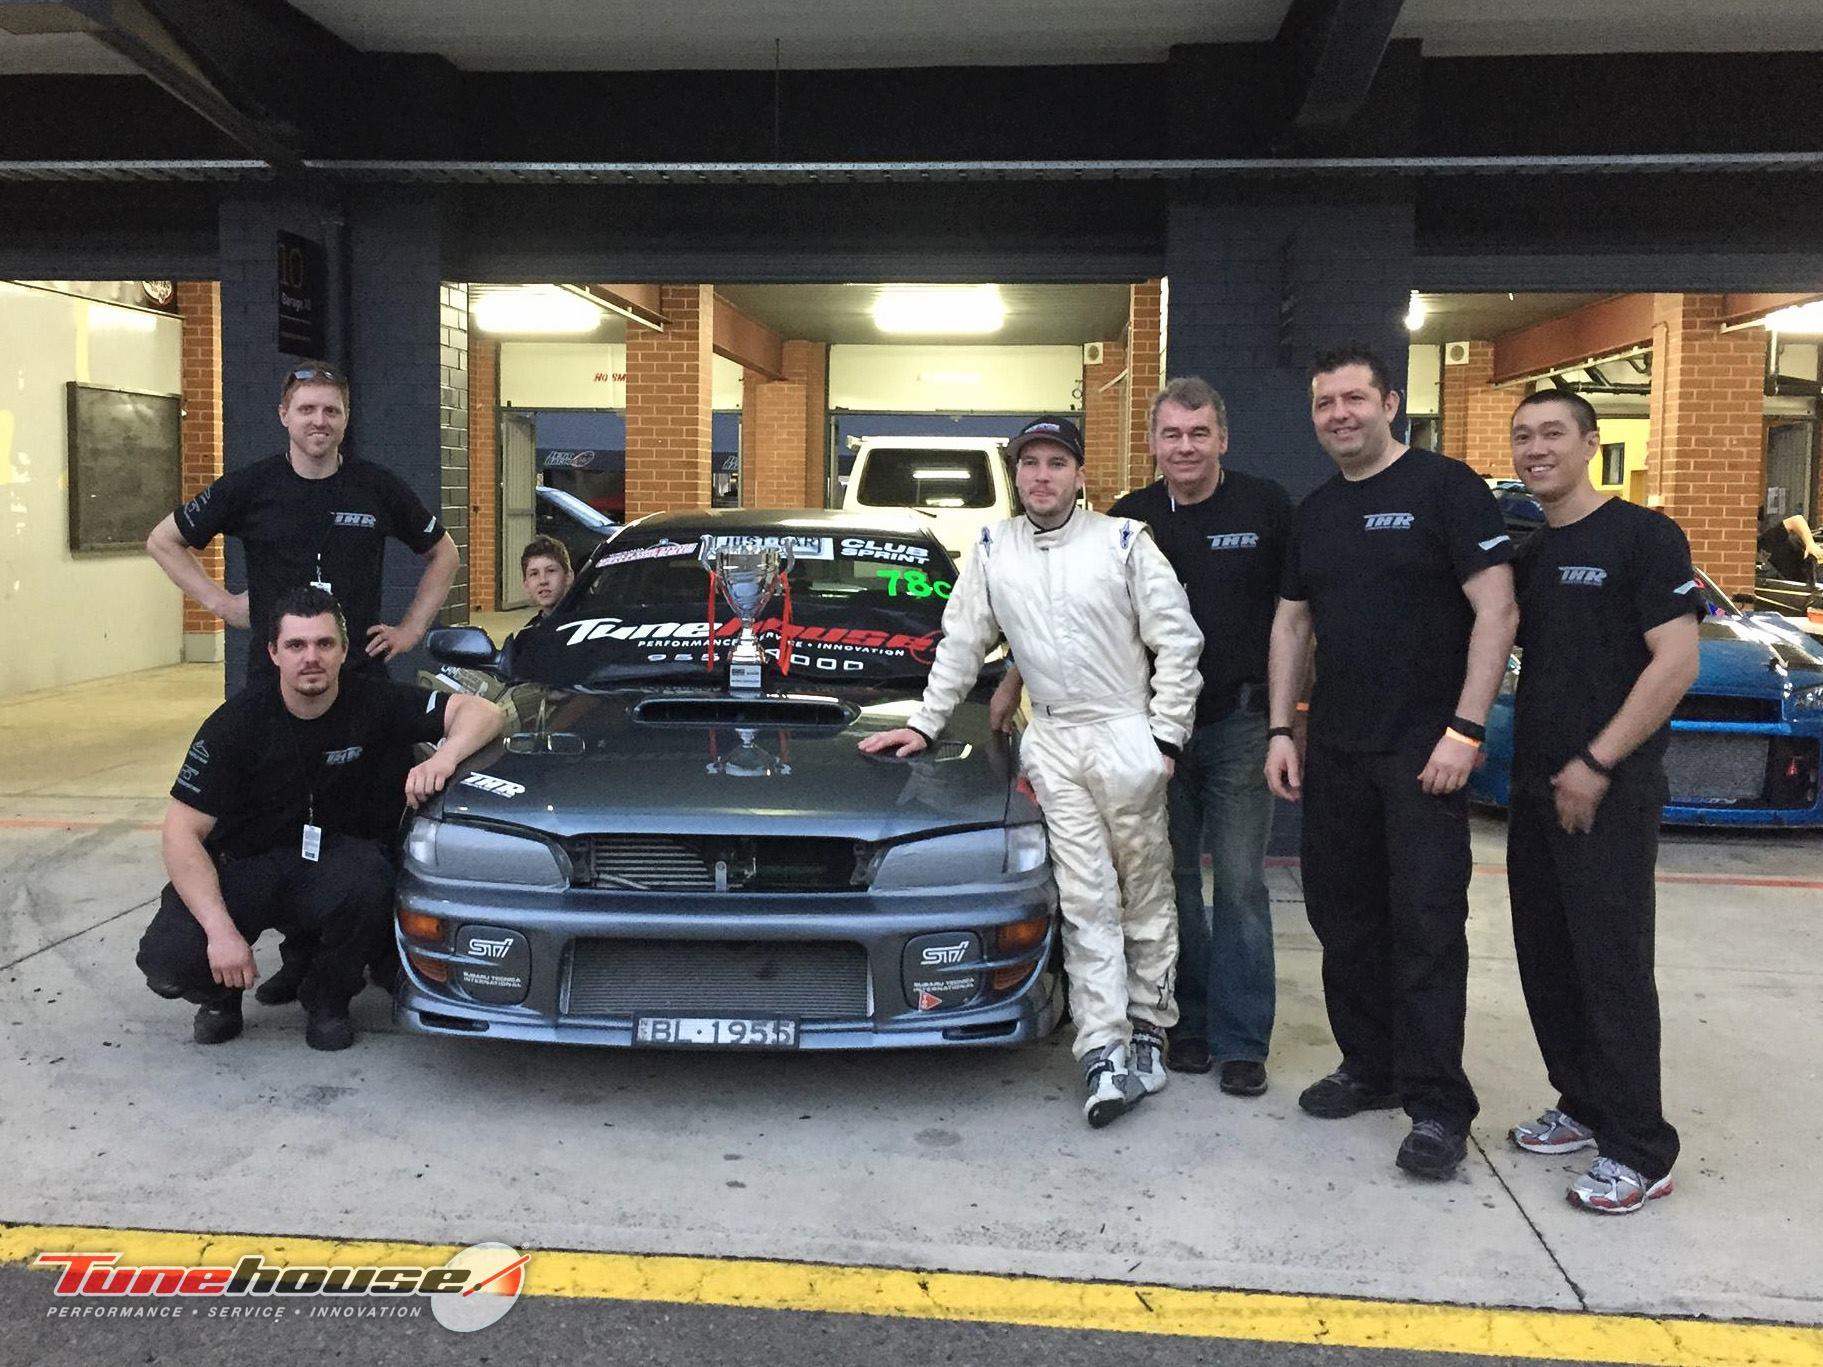 WTAC Tunehouse Subaru WRX Brian Lord 2nd Clubclass